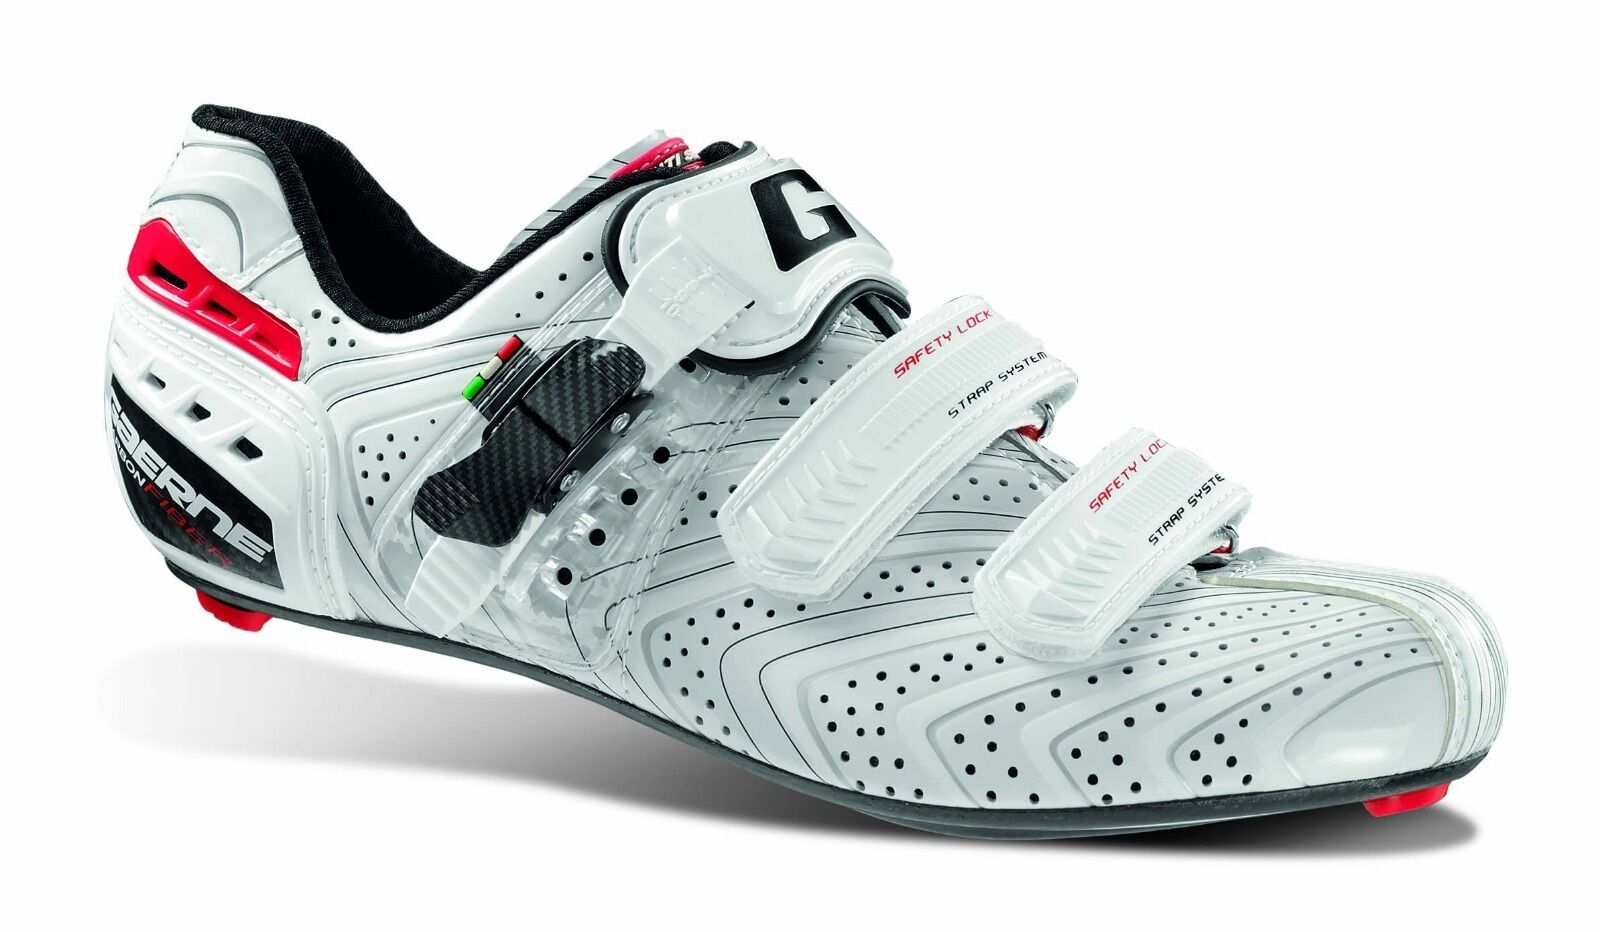 Gaerne Carbon G.Mythos Plus Men's Cycling shoes - White size 40 (Retail  450)